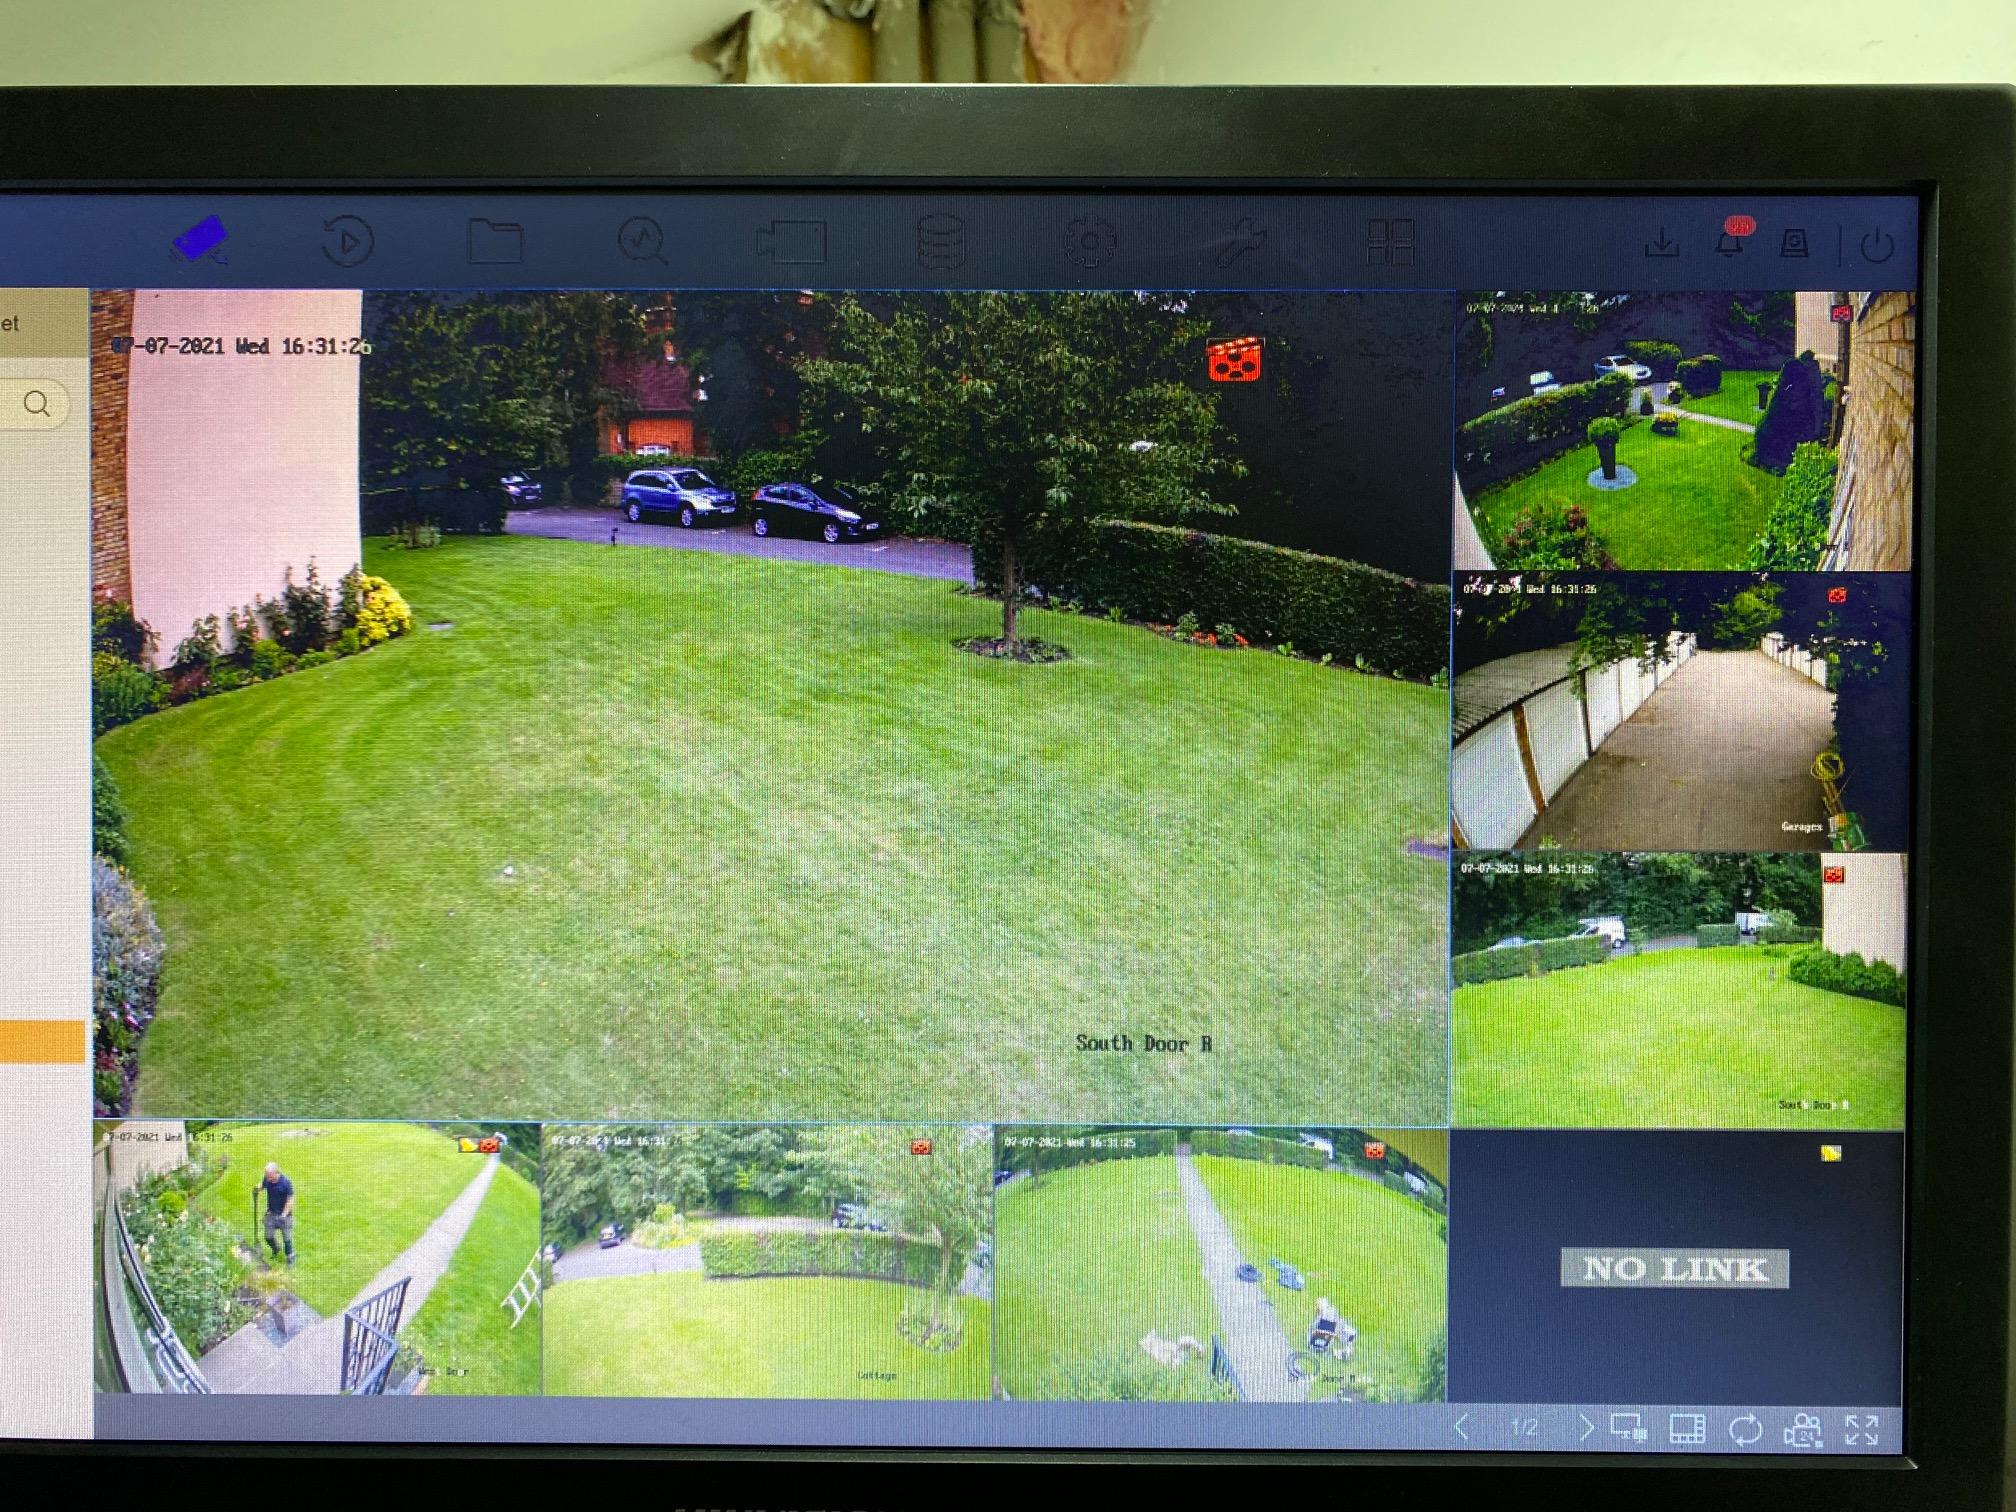 CCTV Chislehurst Flats